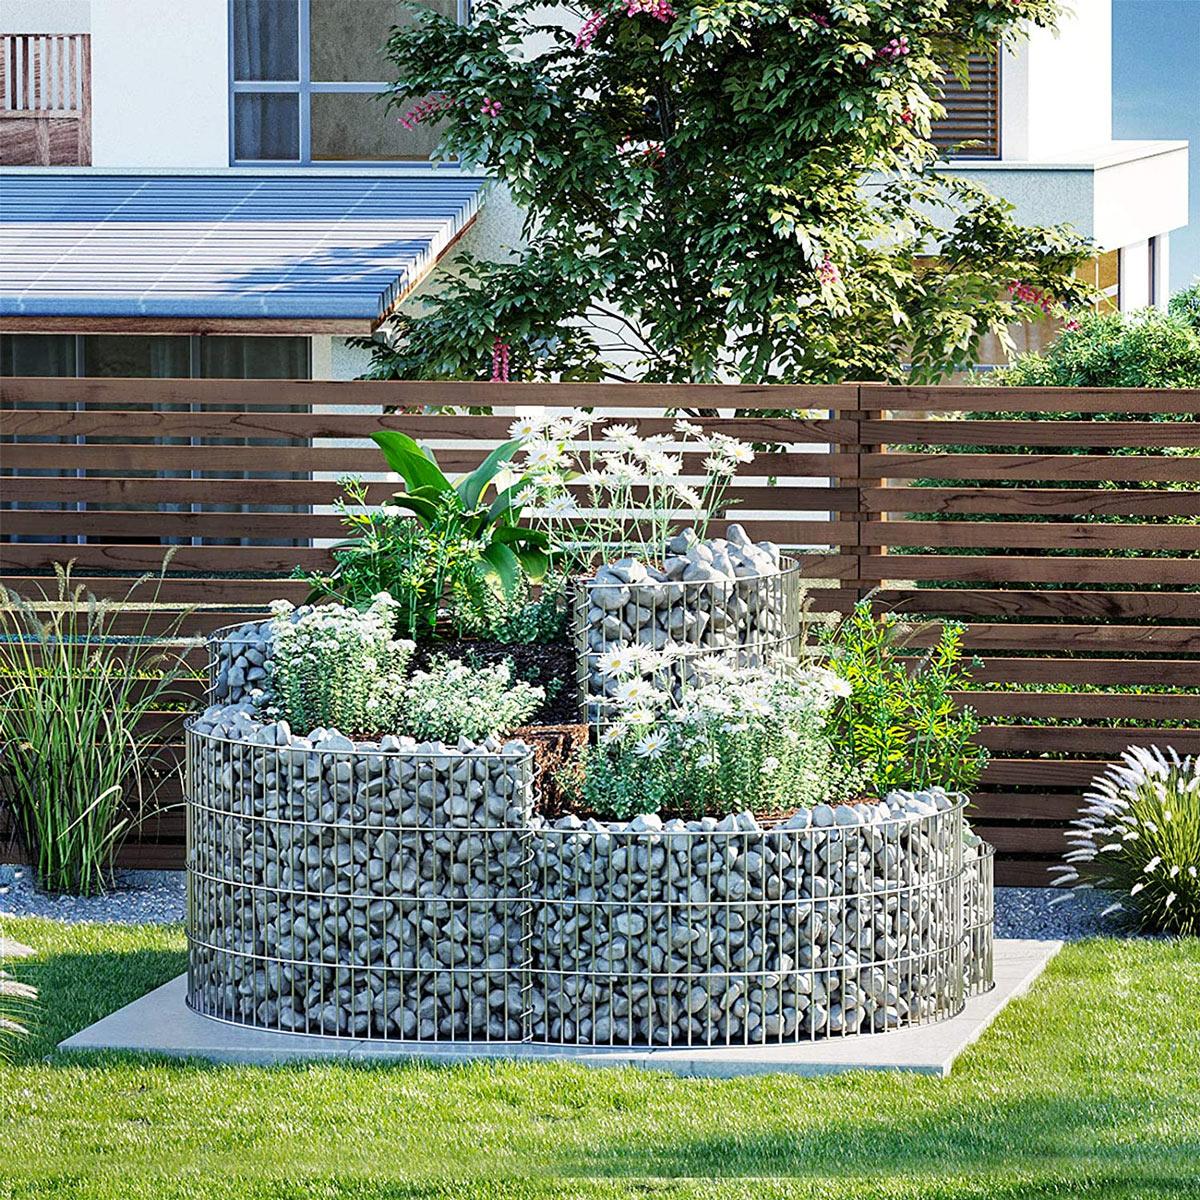 Gabbioni metallici e pietre in giardino.